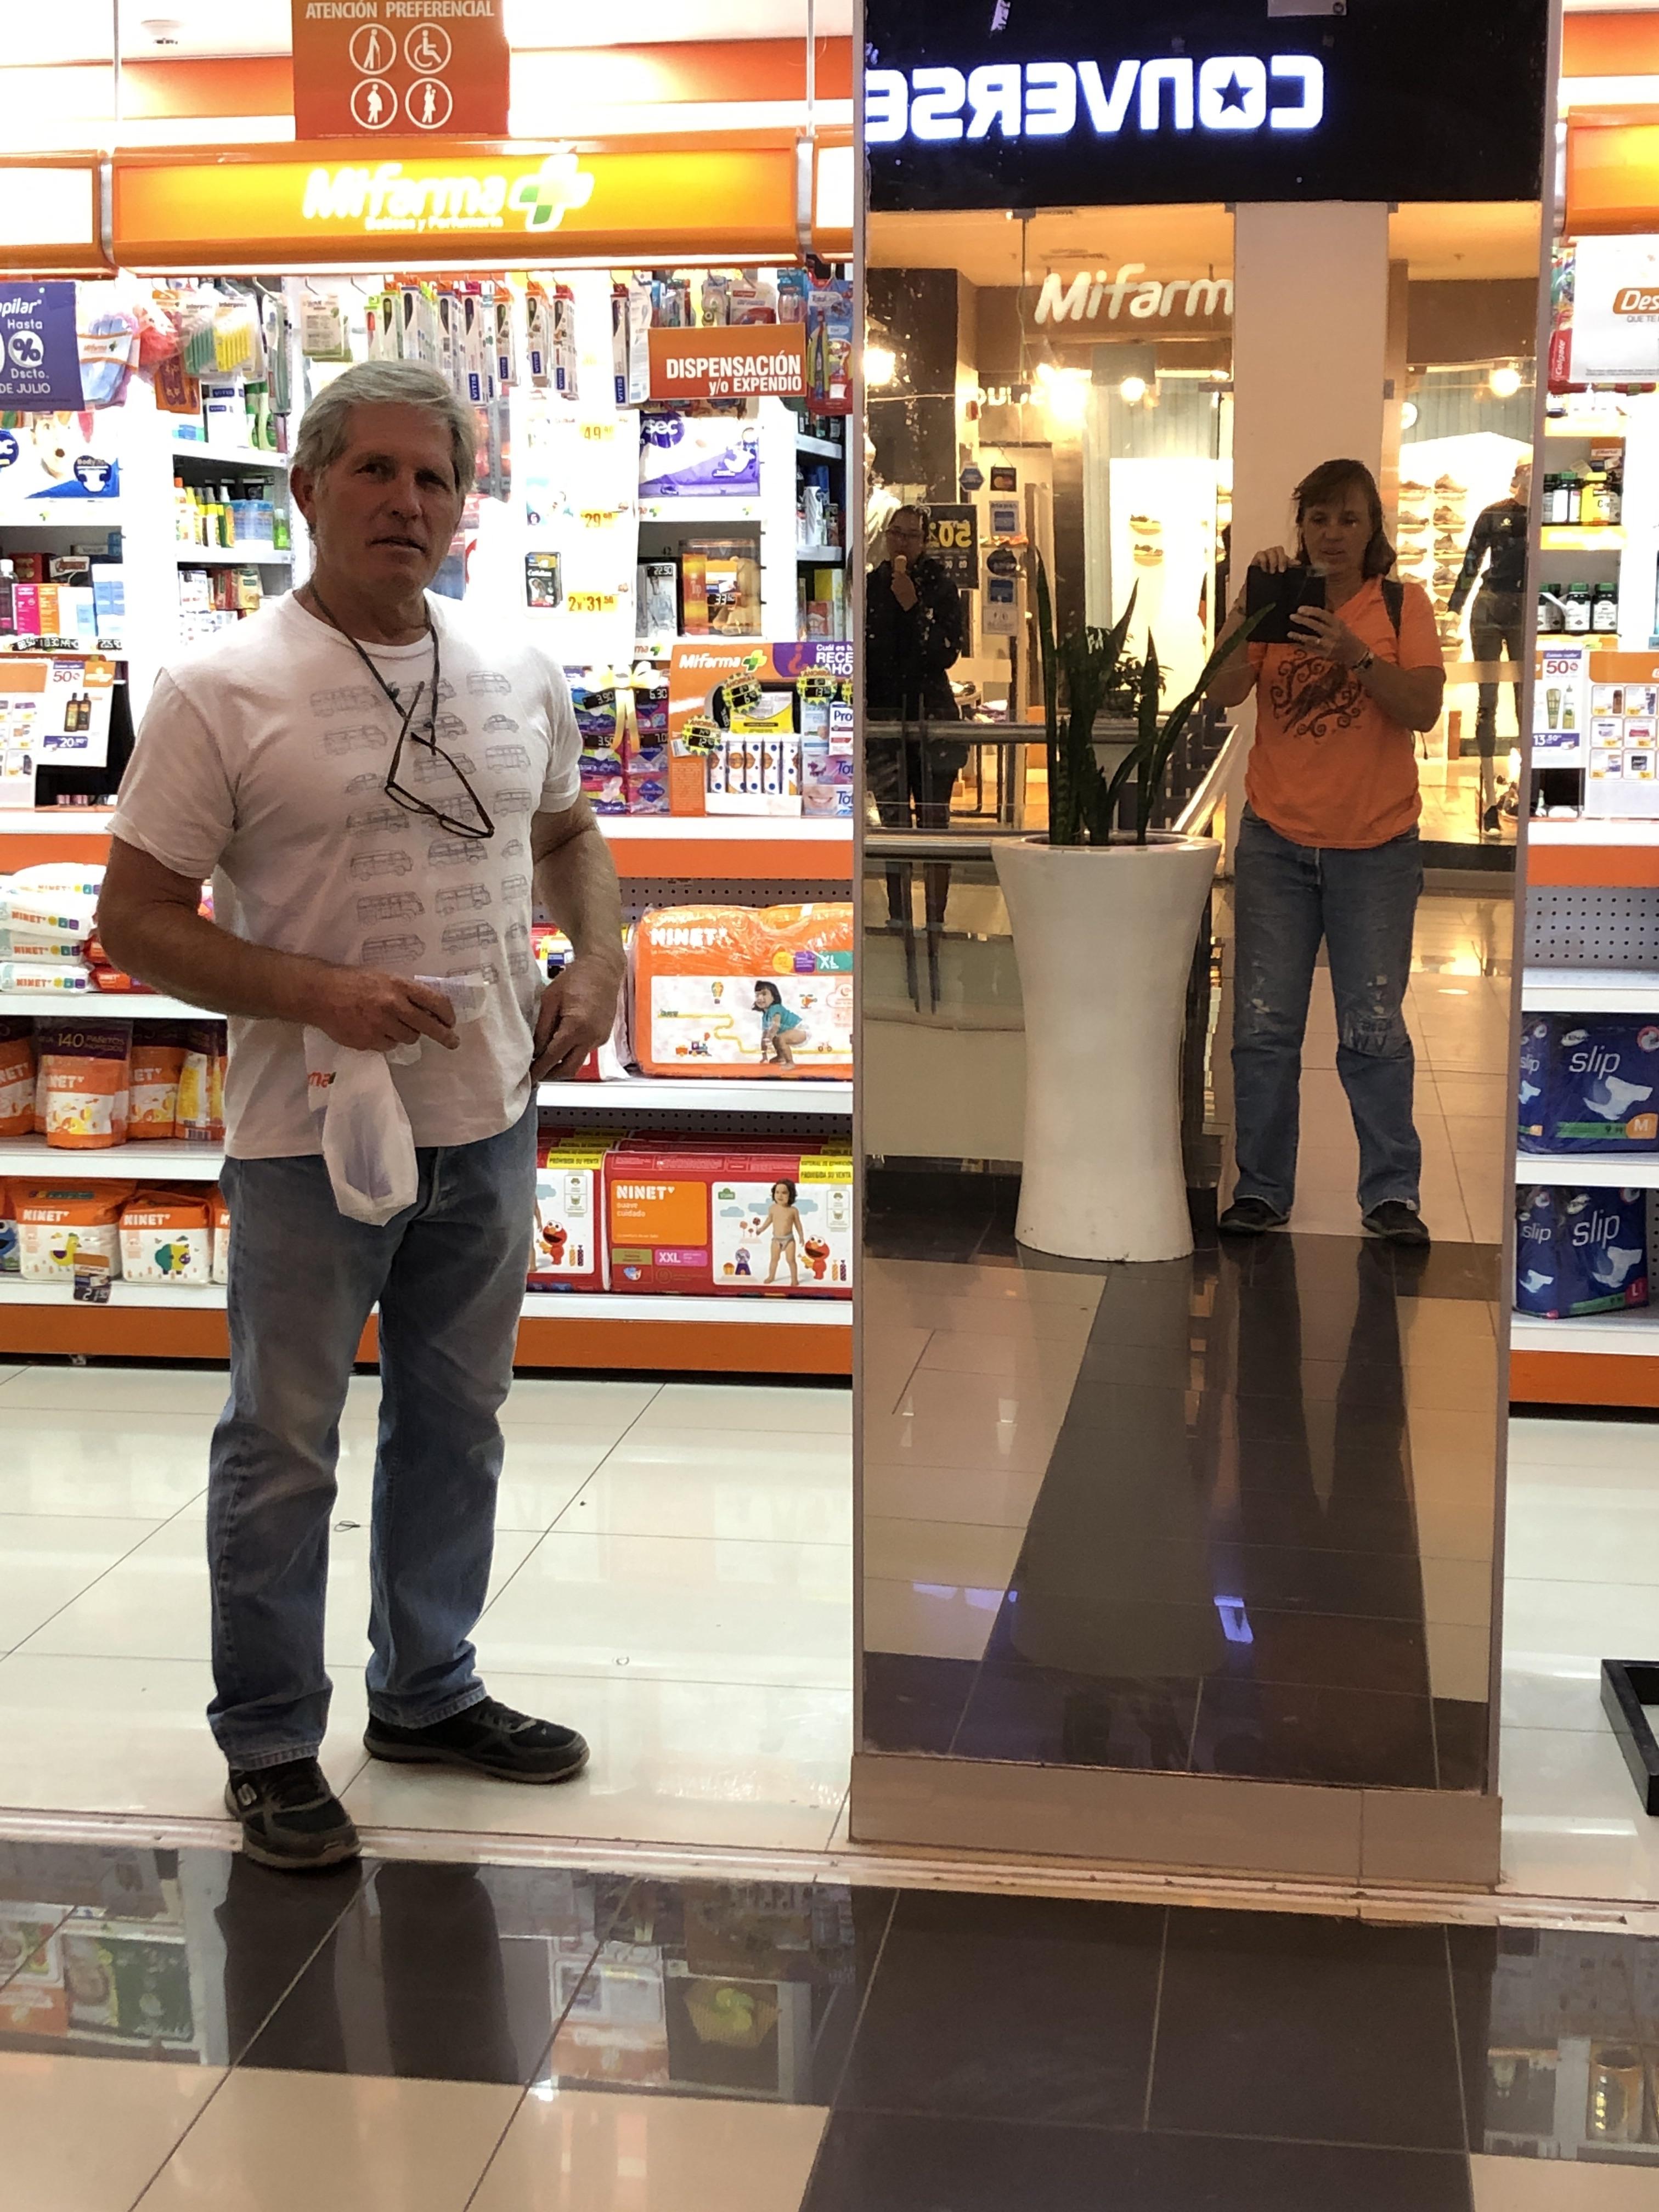 mall fun with mirrors1.jpg